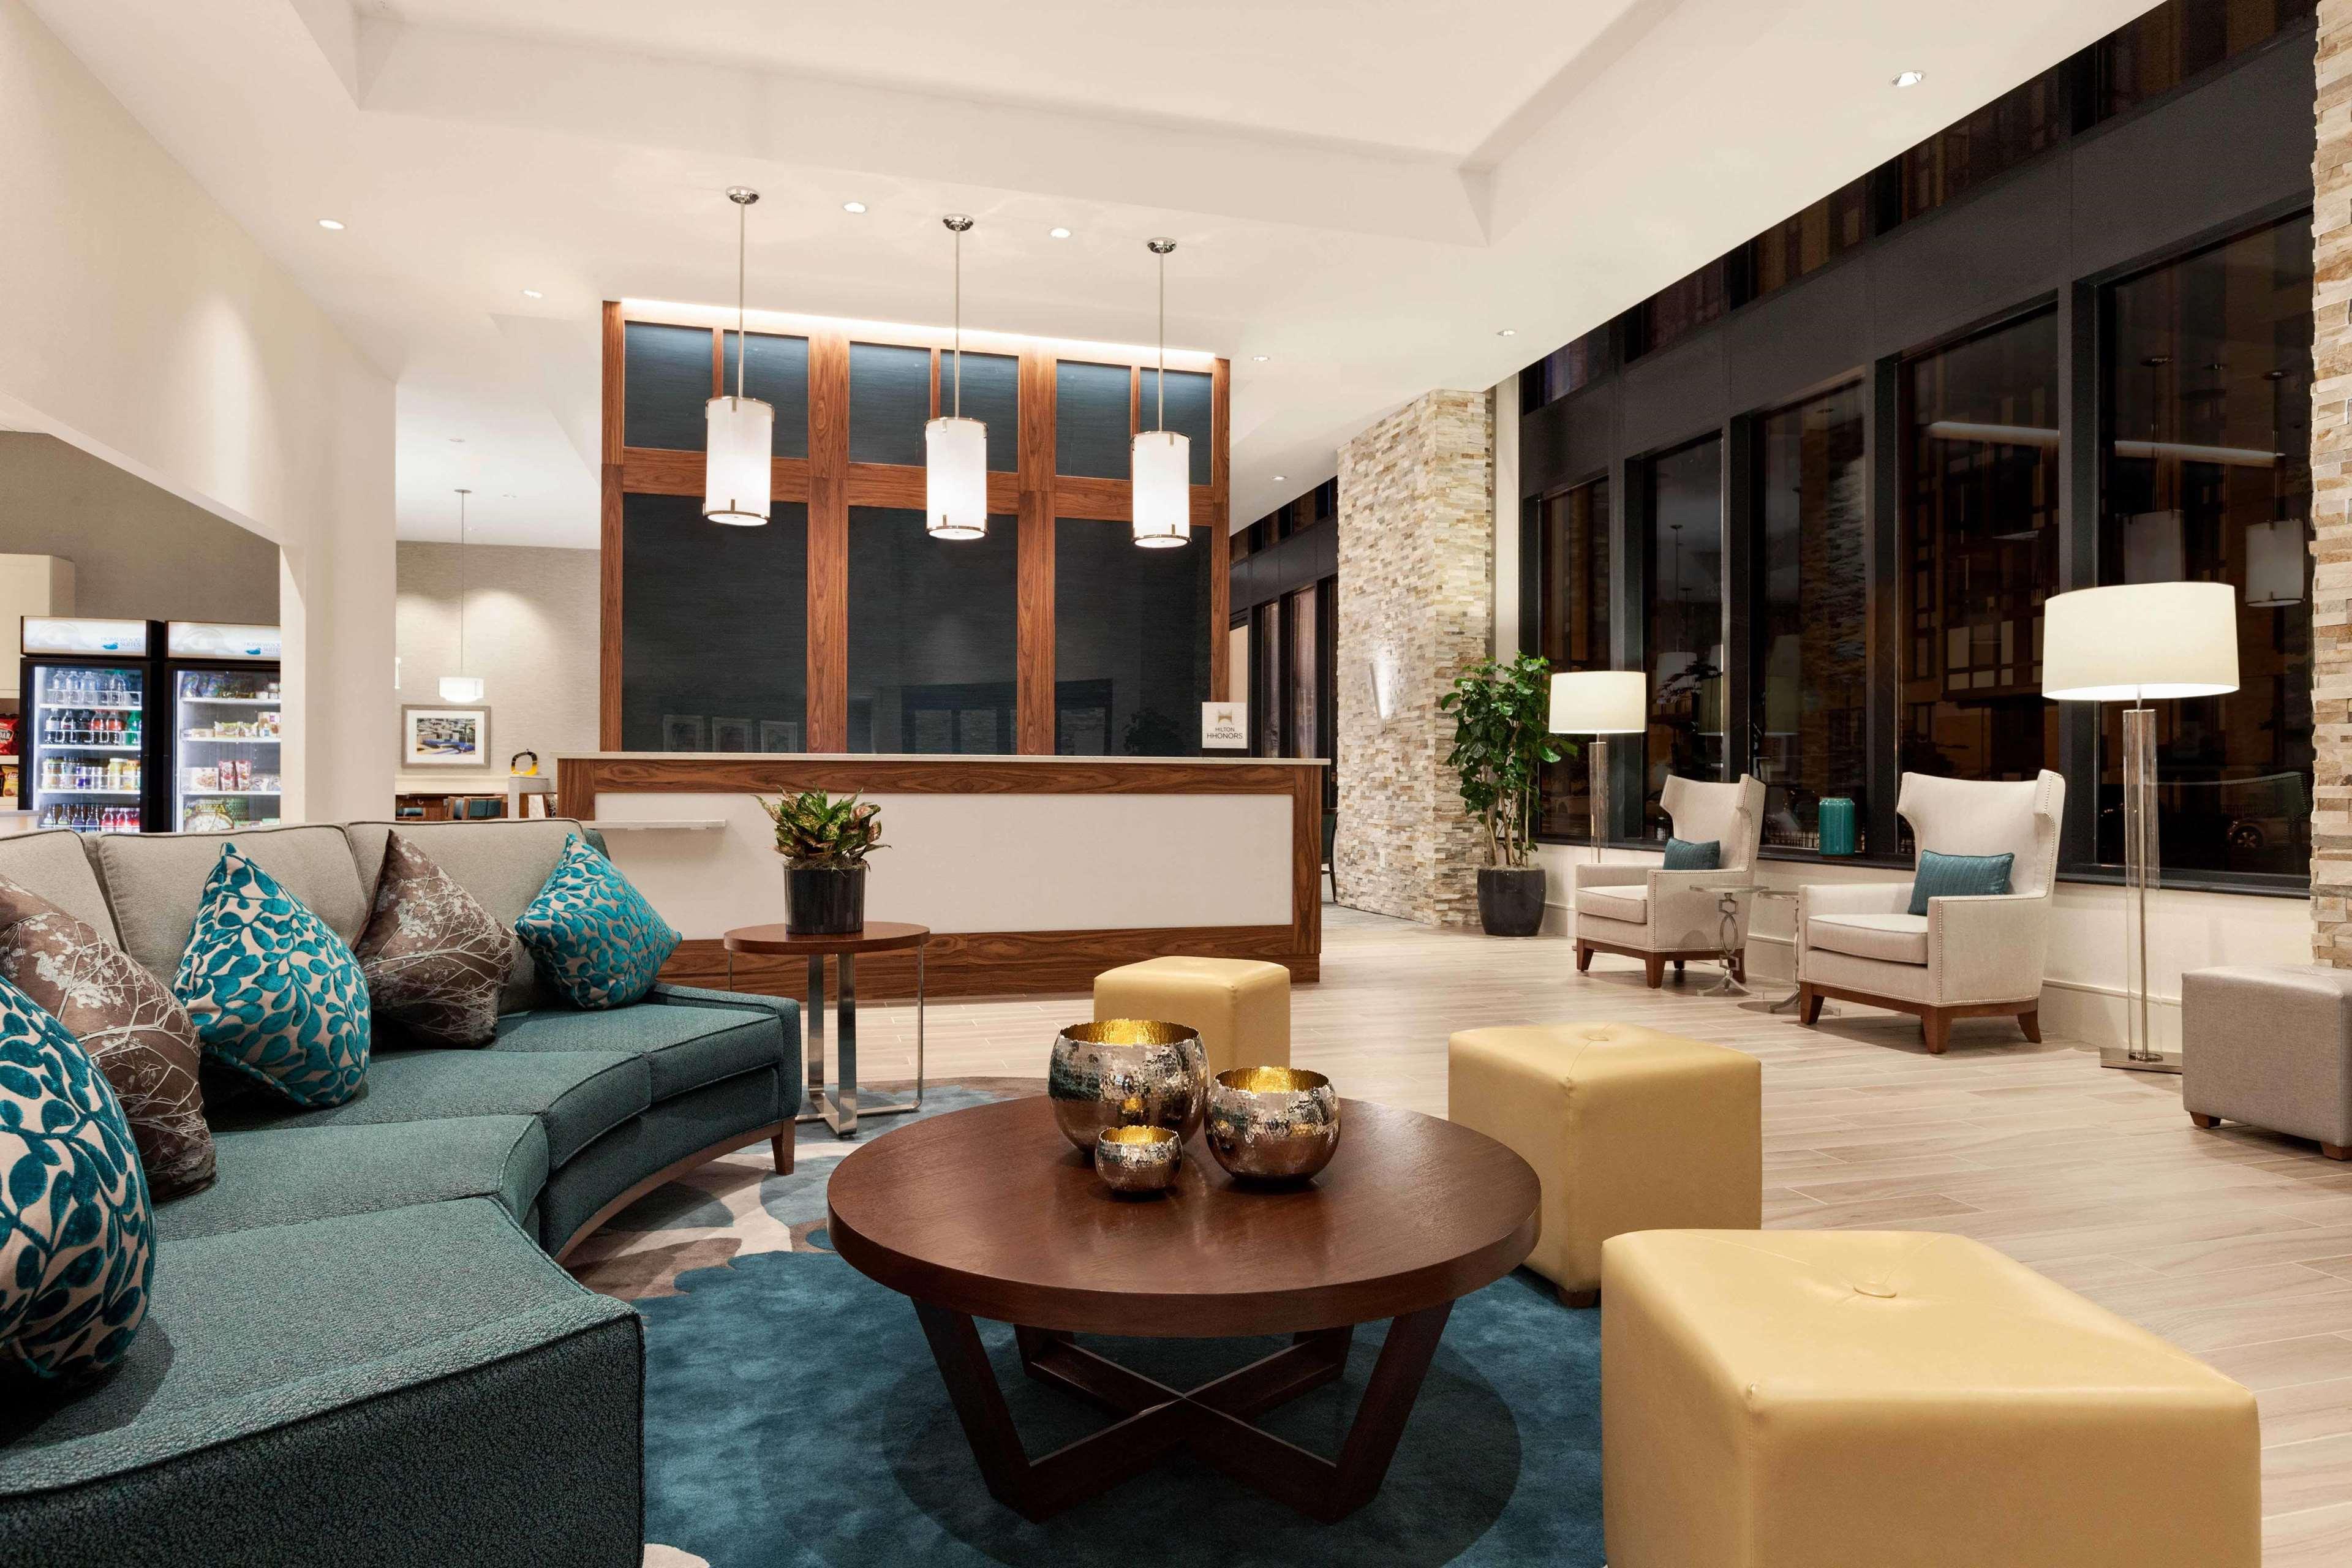 Homewood Suites by Hilton Washington DC Convention Center image 7